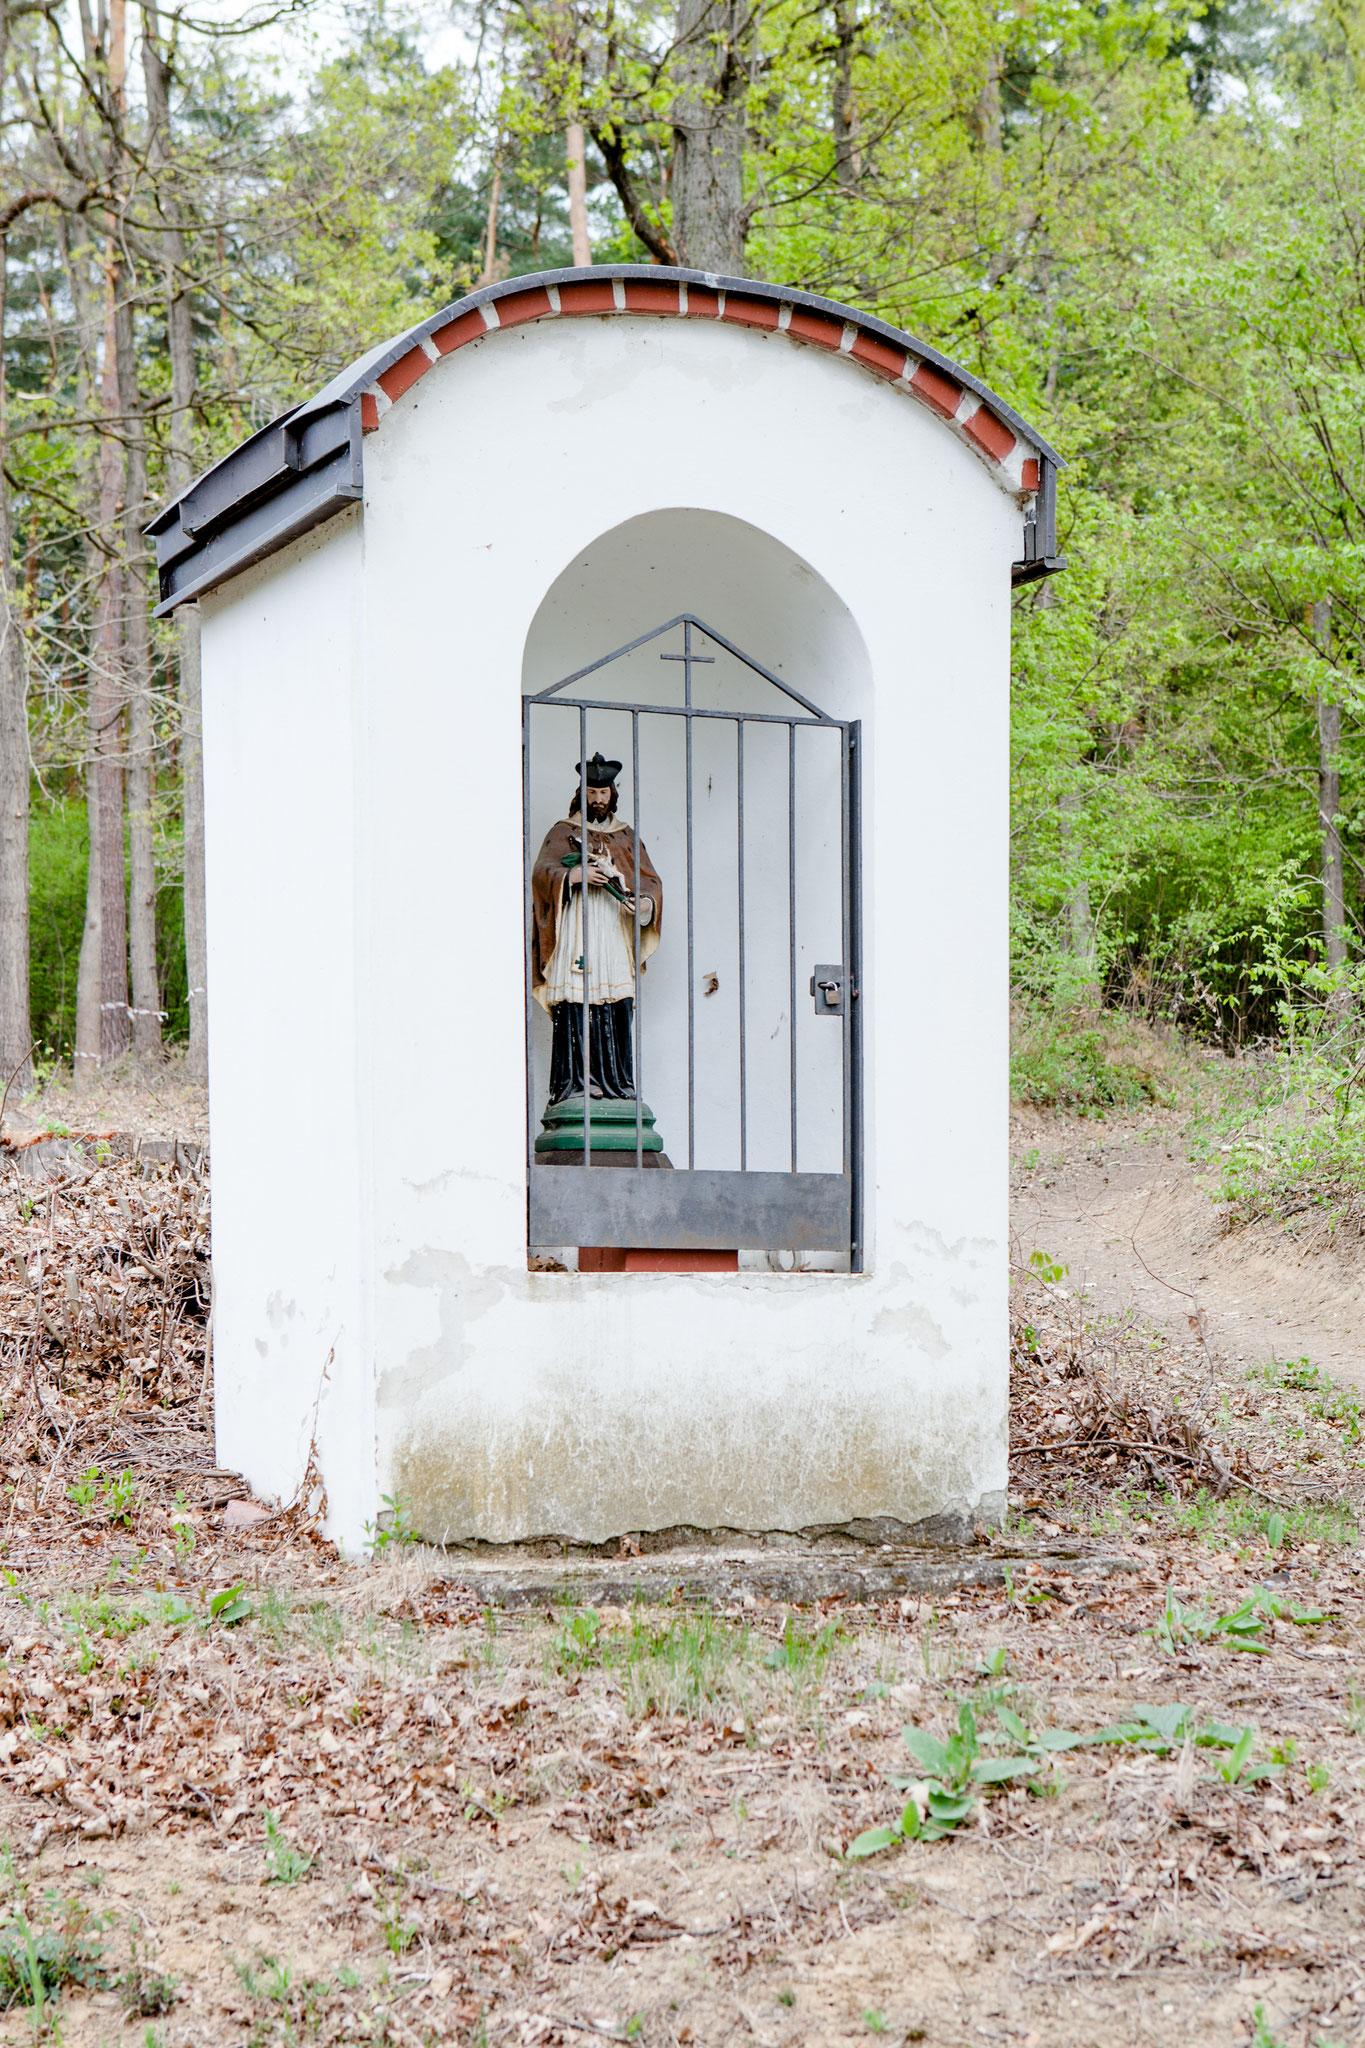 Kapelle Richtung Dörfl: betreut von Familie Szegner, Mühlgasse